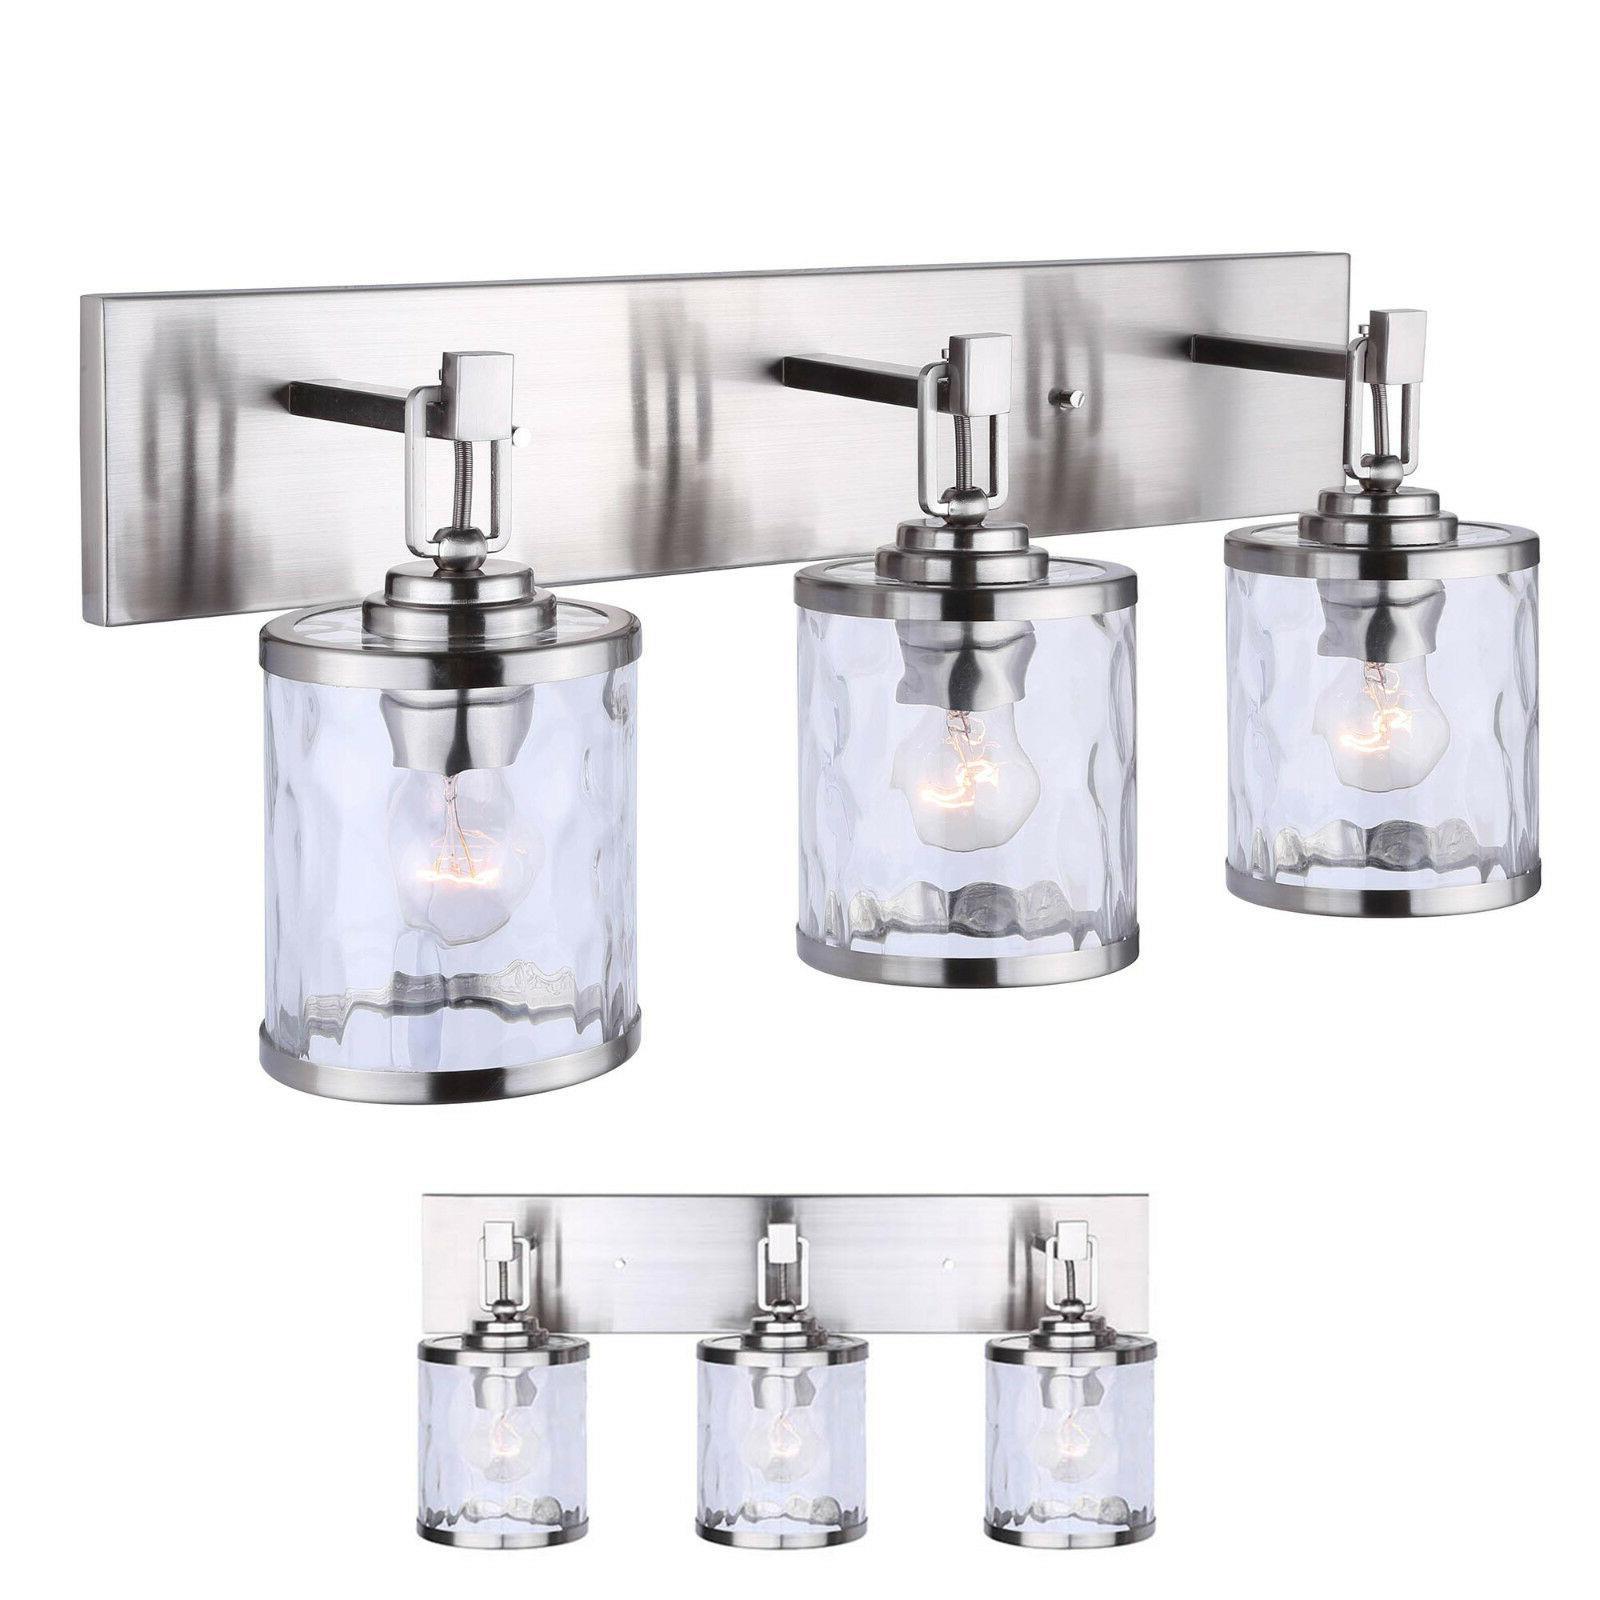 Brushed Nickel Vanity 3 Light Bathroom Fixture Bath Bar, Cle